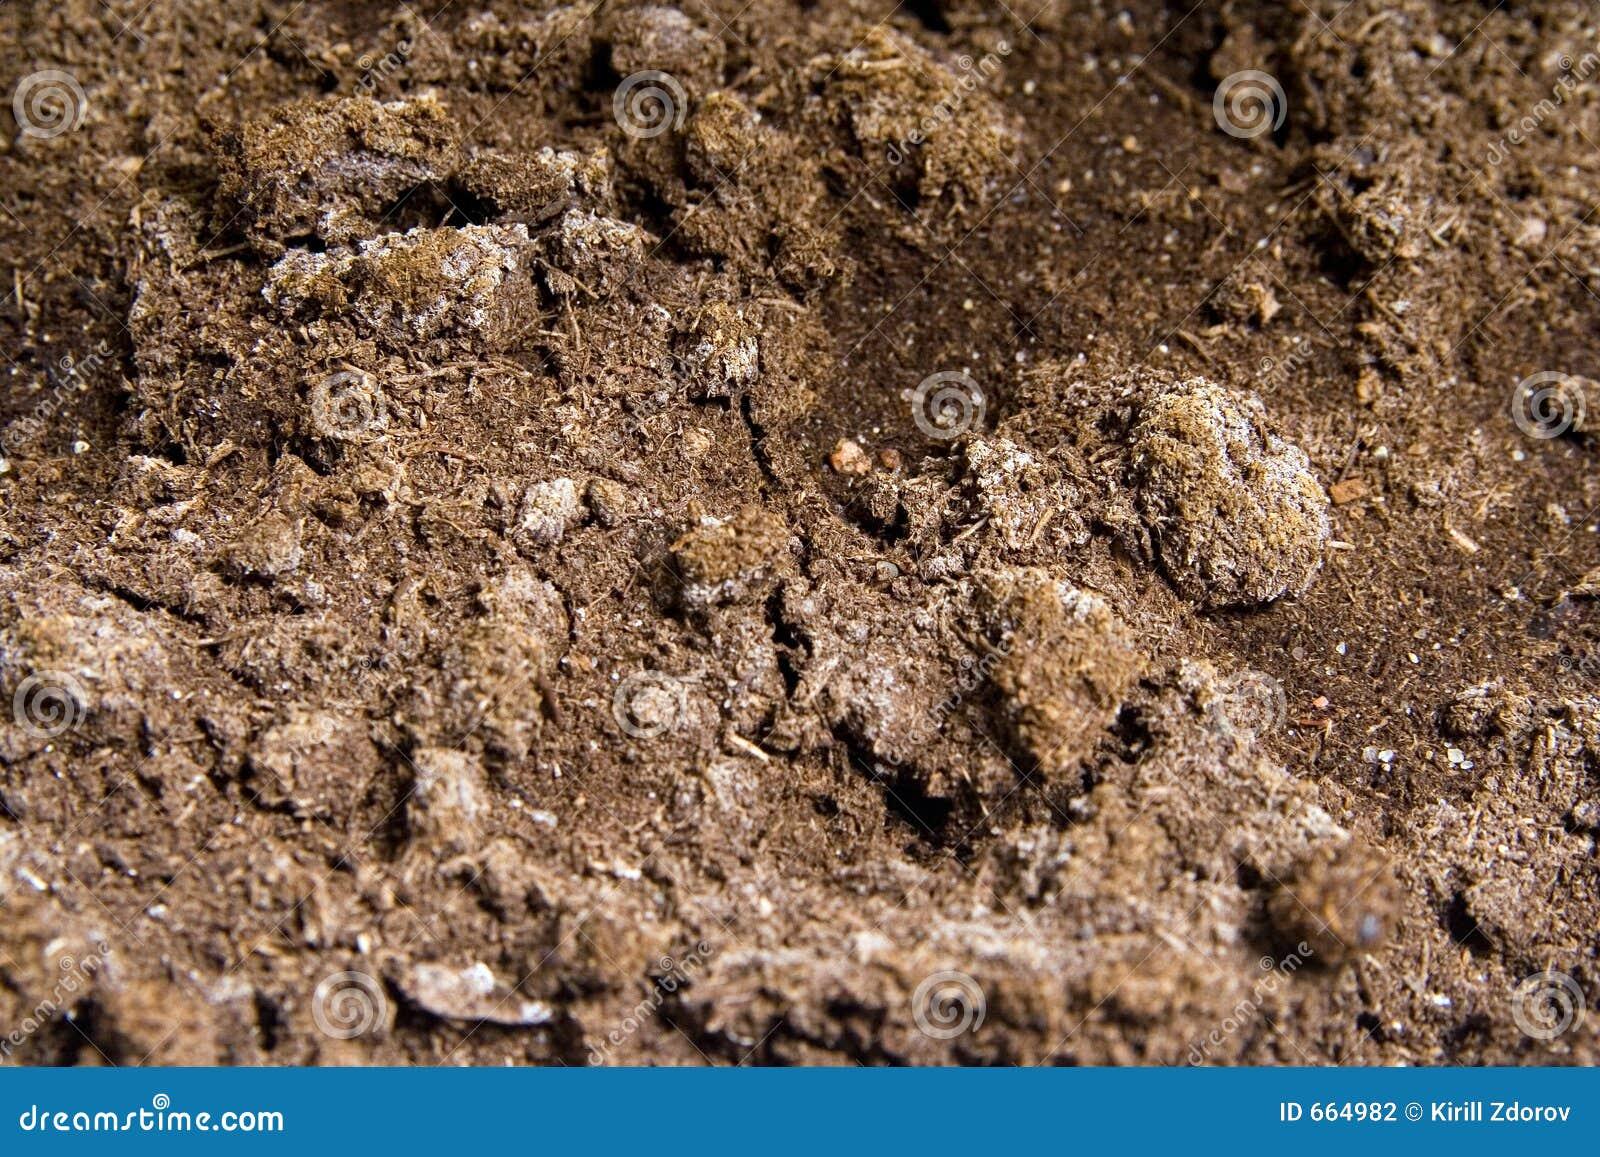 Soil stock photography image 664982 for The soil 02joy